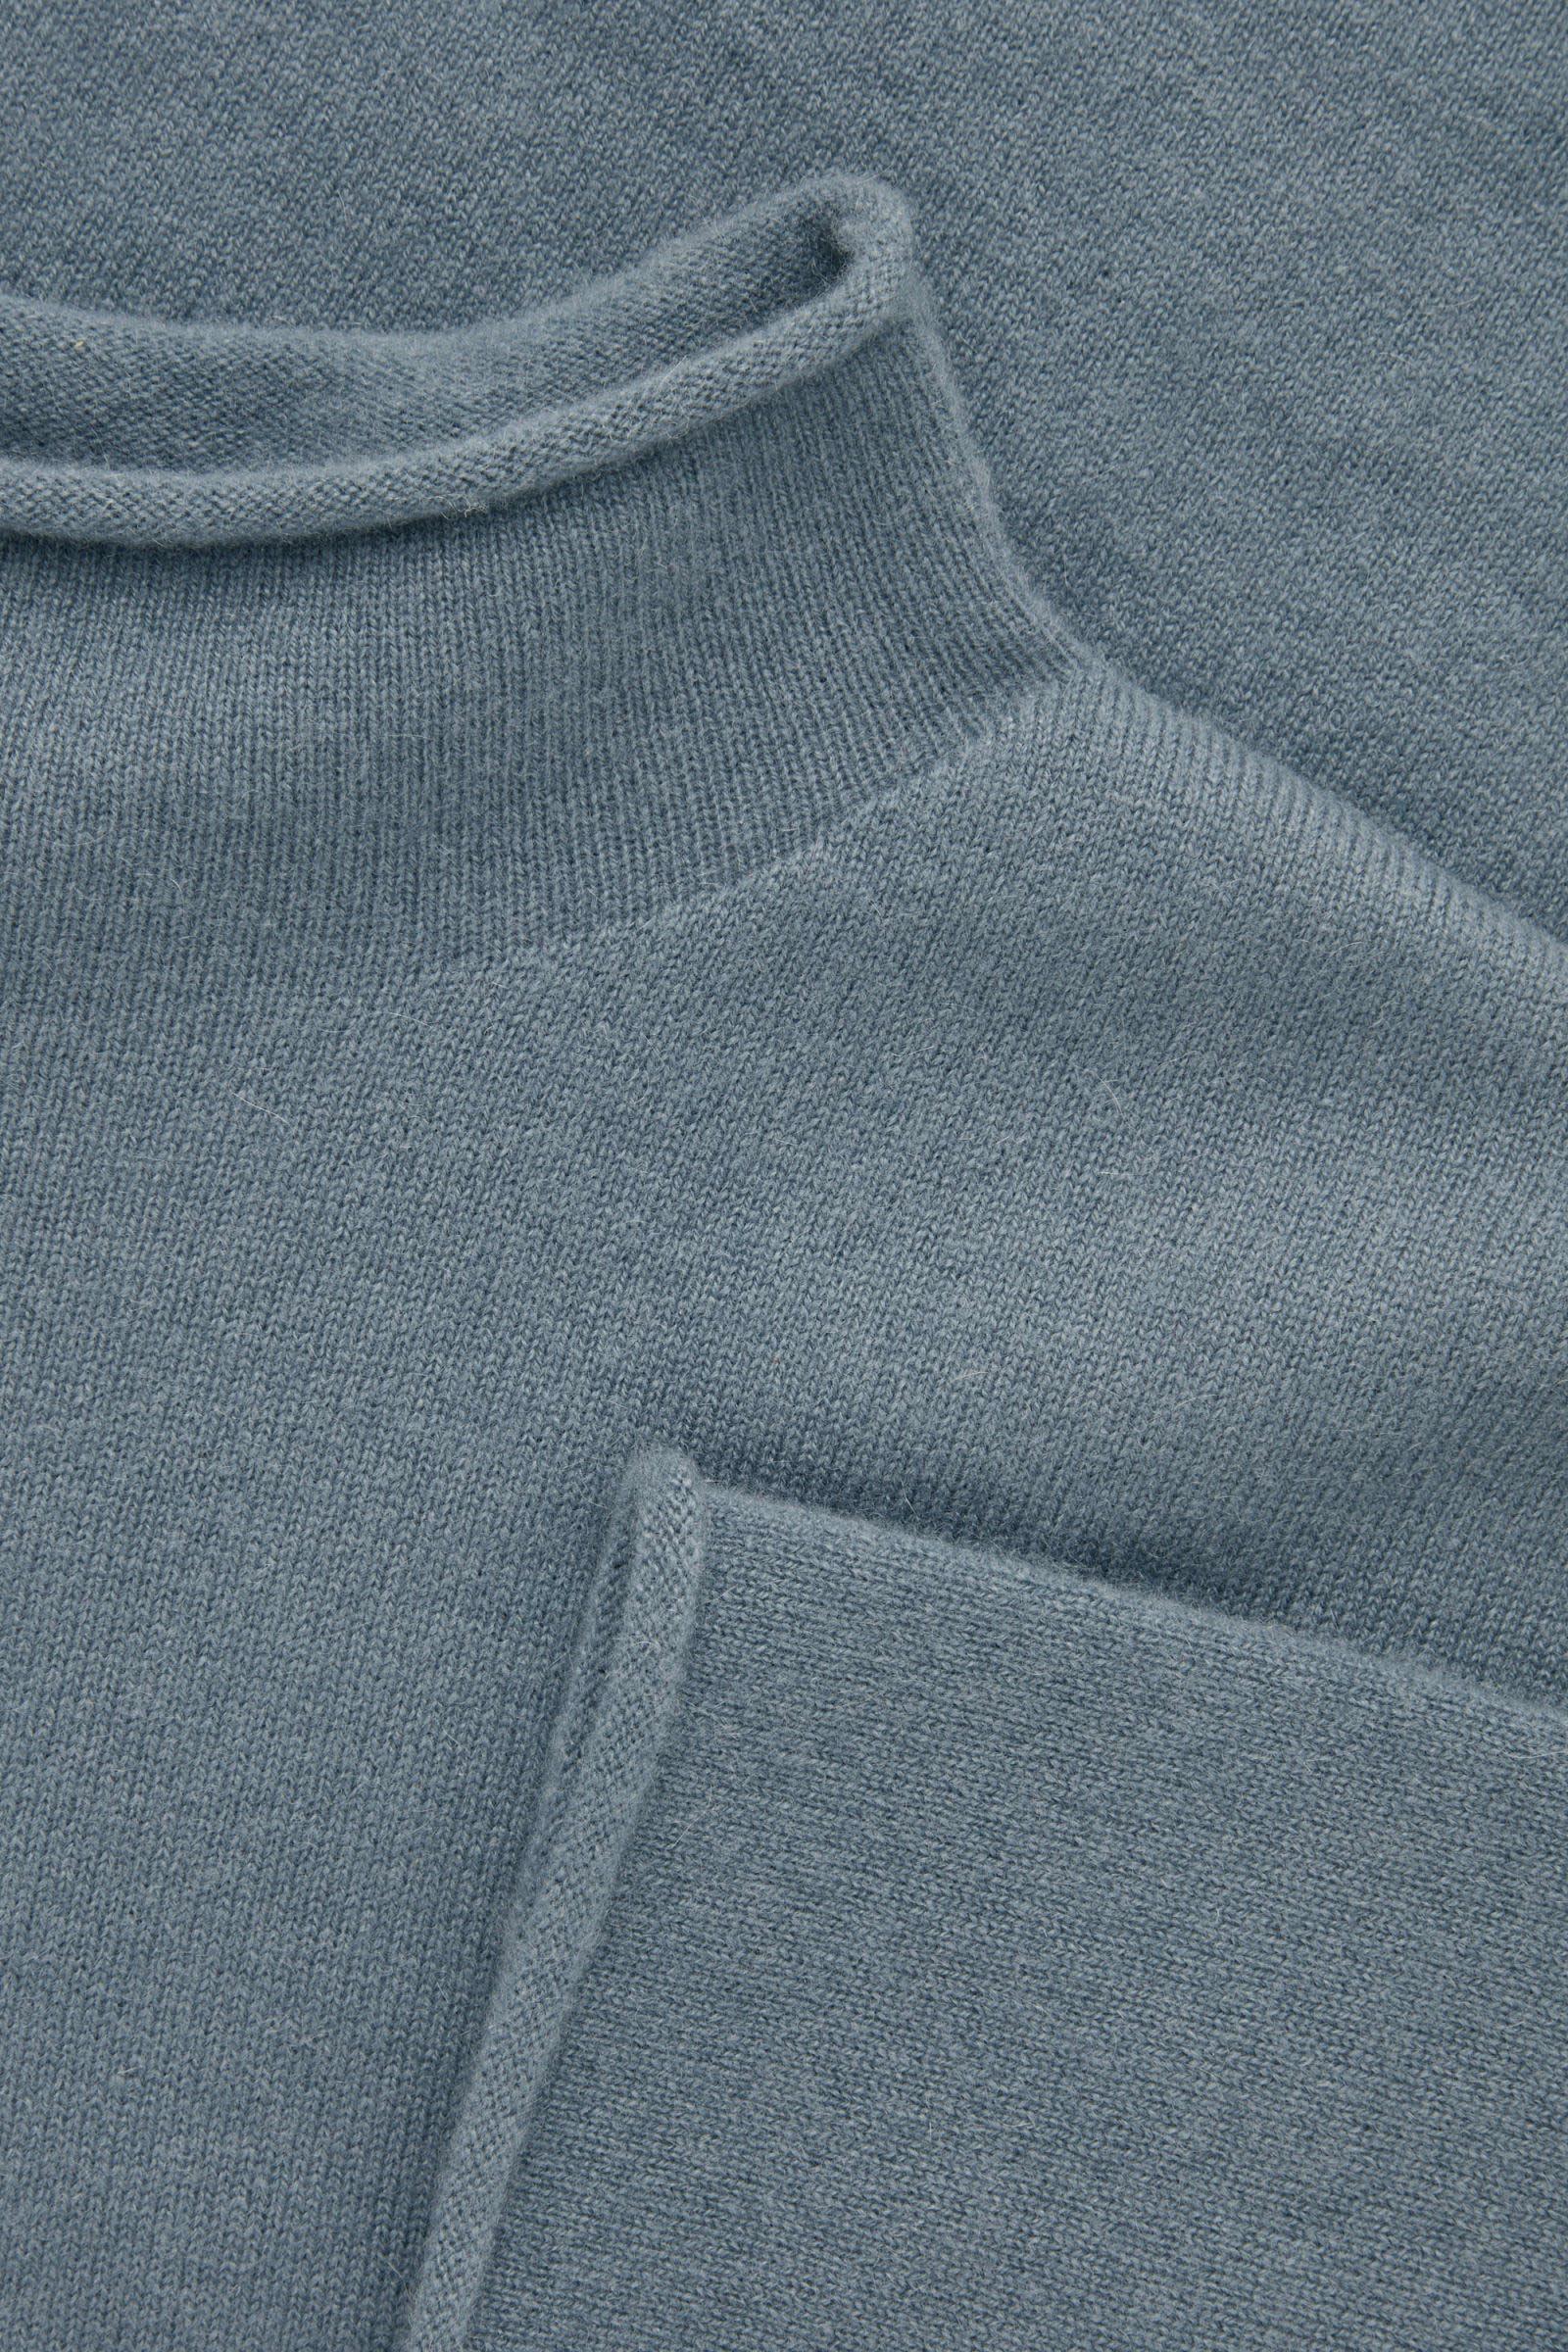 COS 캐시미어 모크넥 스웨터의 라이트 슬레이트 블루컬러 Detail입니다.